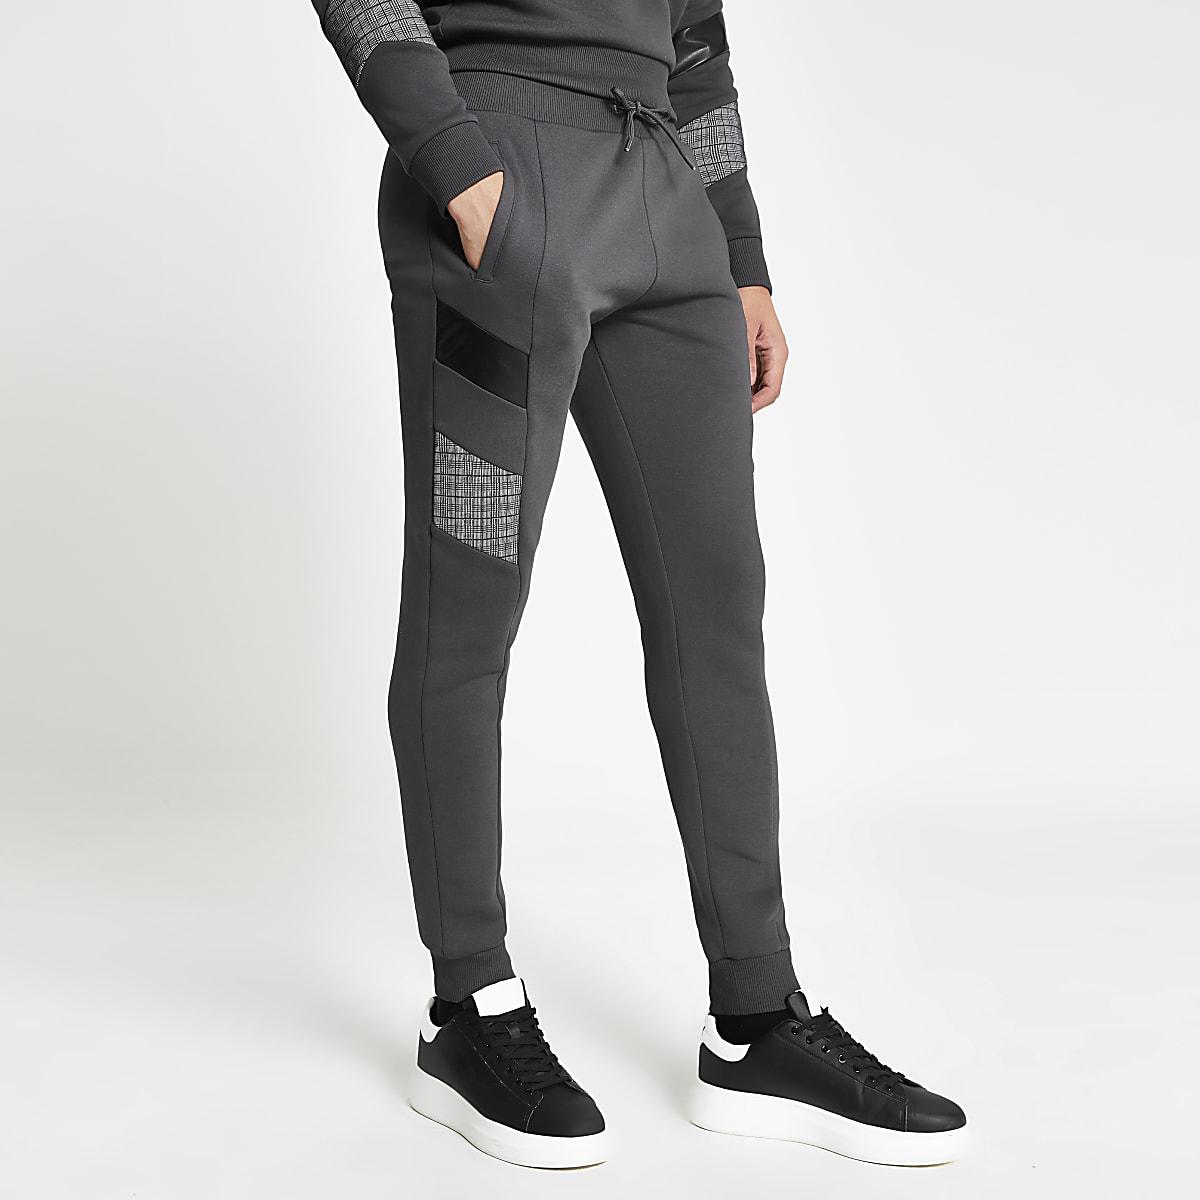 Grey blocked Maison Riviera slim joggers